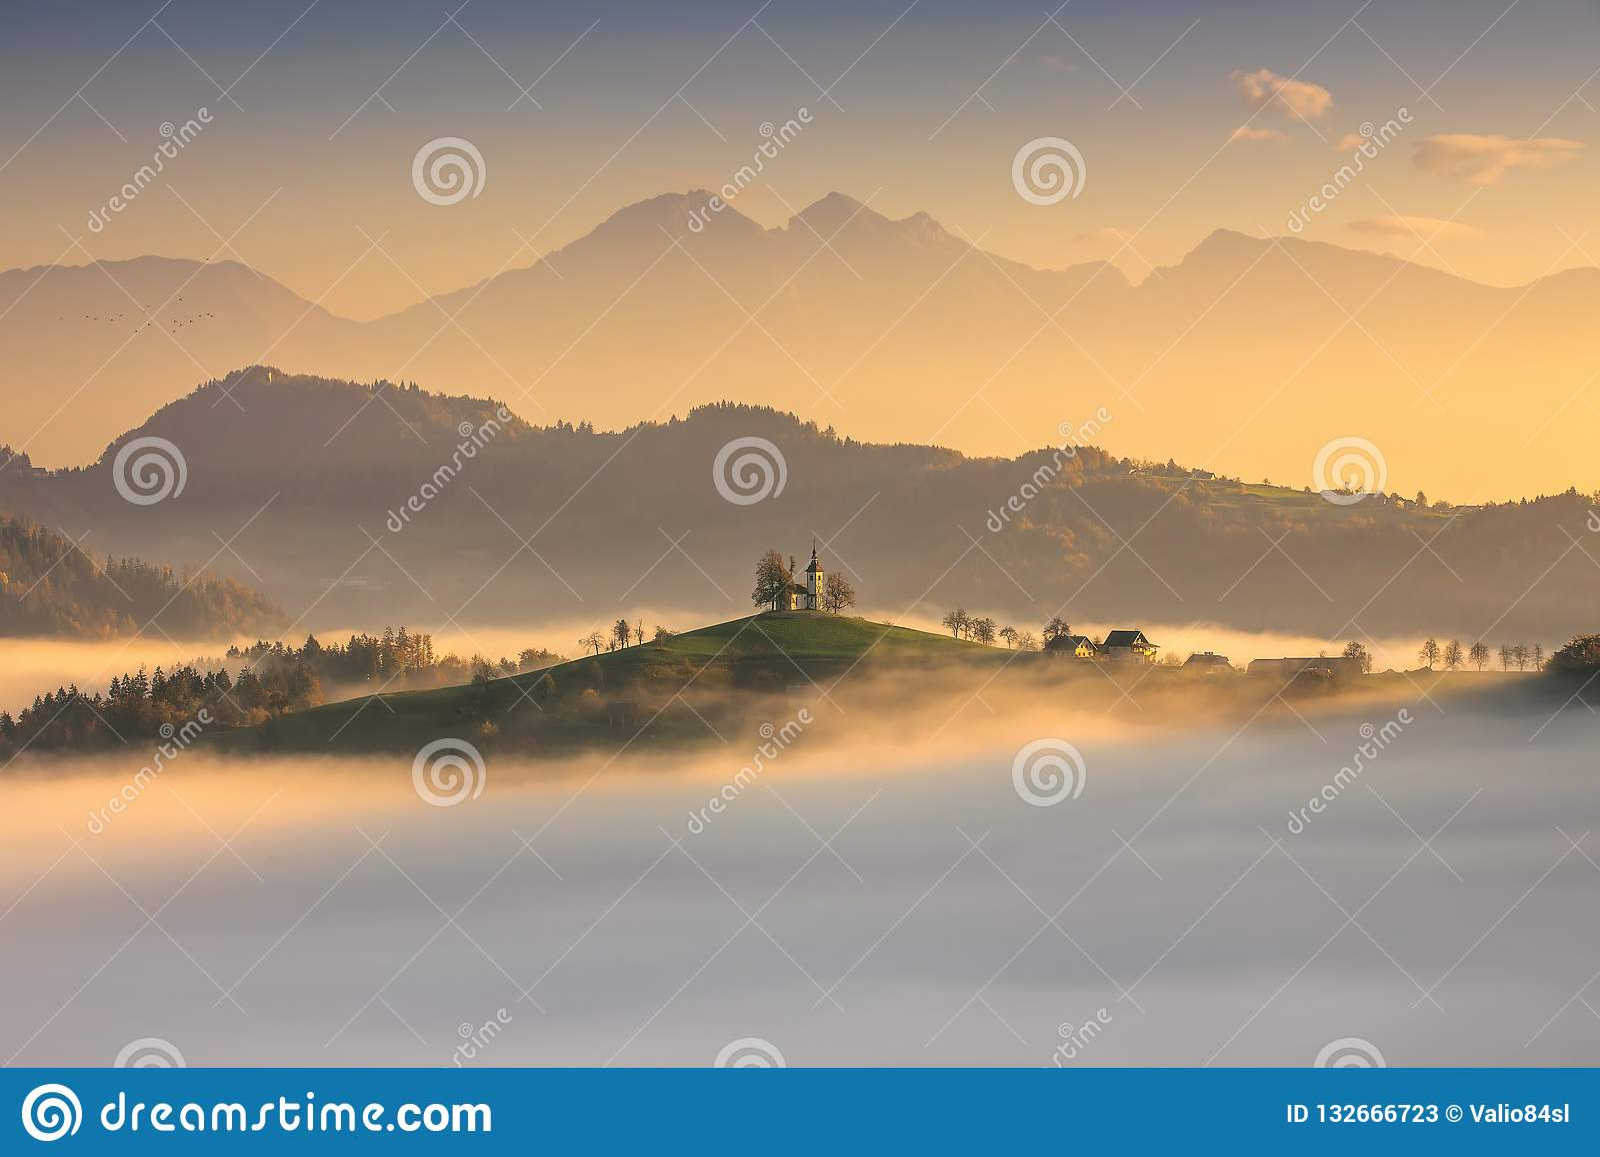 Panoramic view of Saint Tomas church, Slovenia